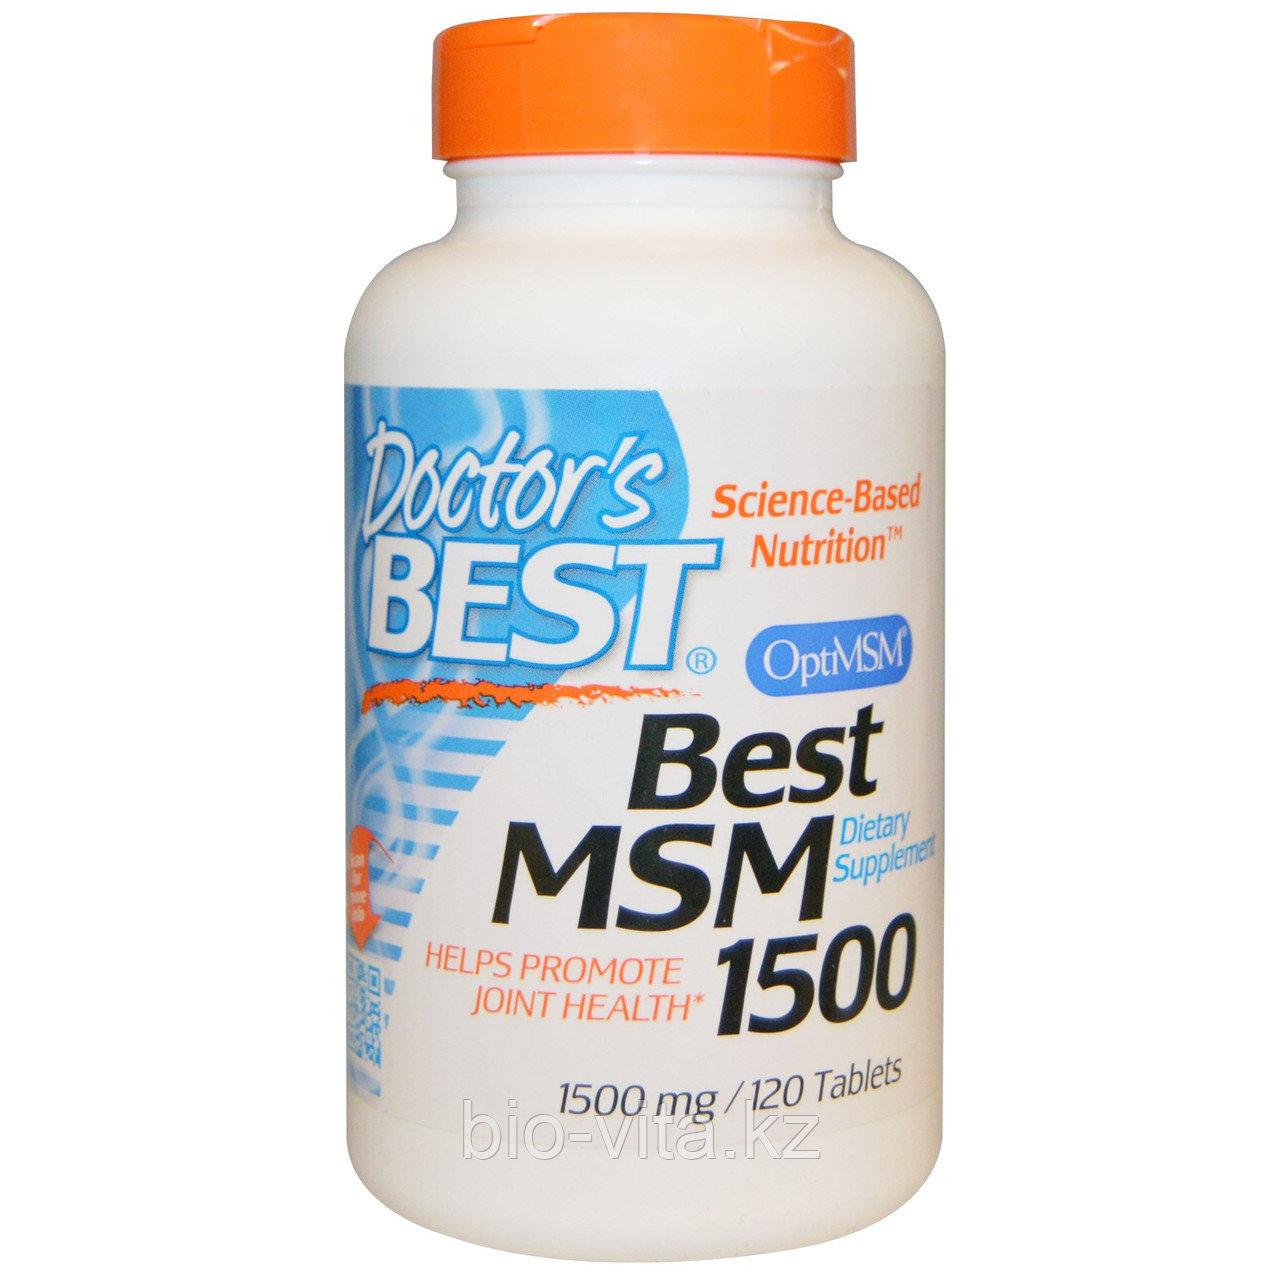 МСМ( MSM) 1500 (метилсульфонилметан), 1500 мг, 120 таблеток Doctor's Best,